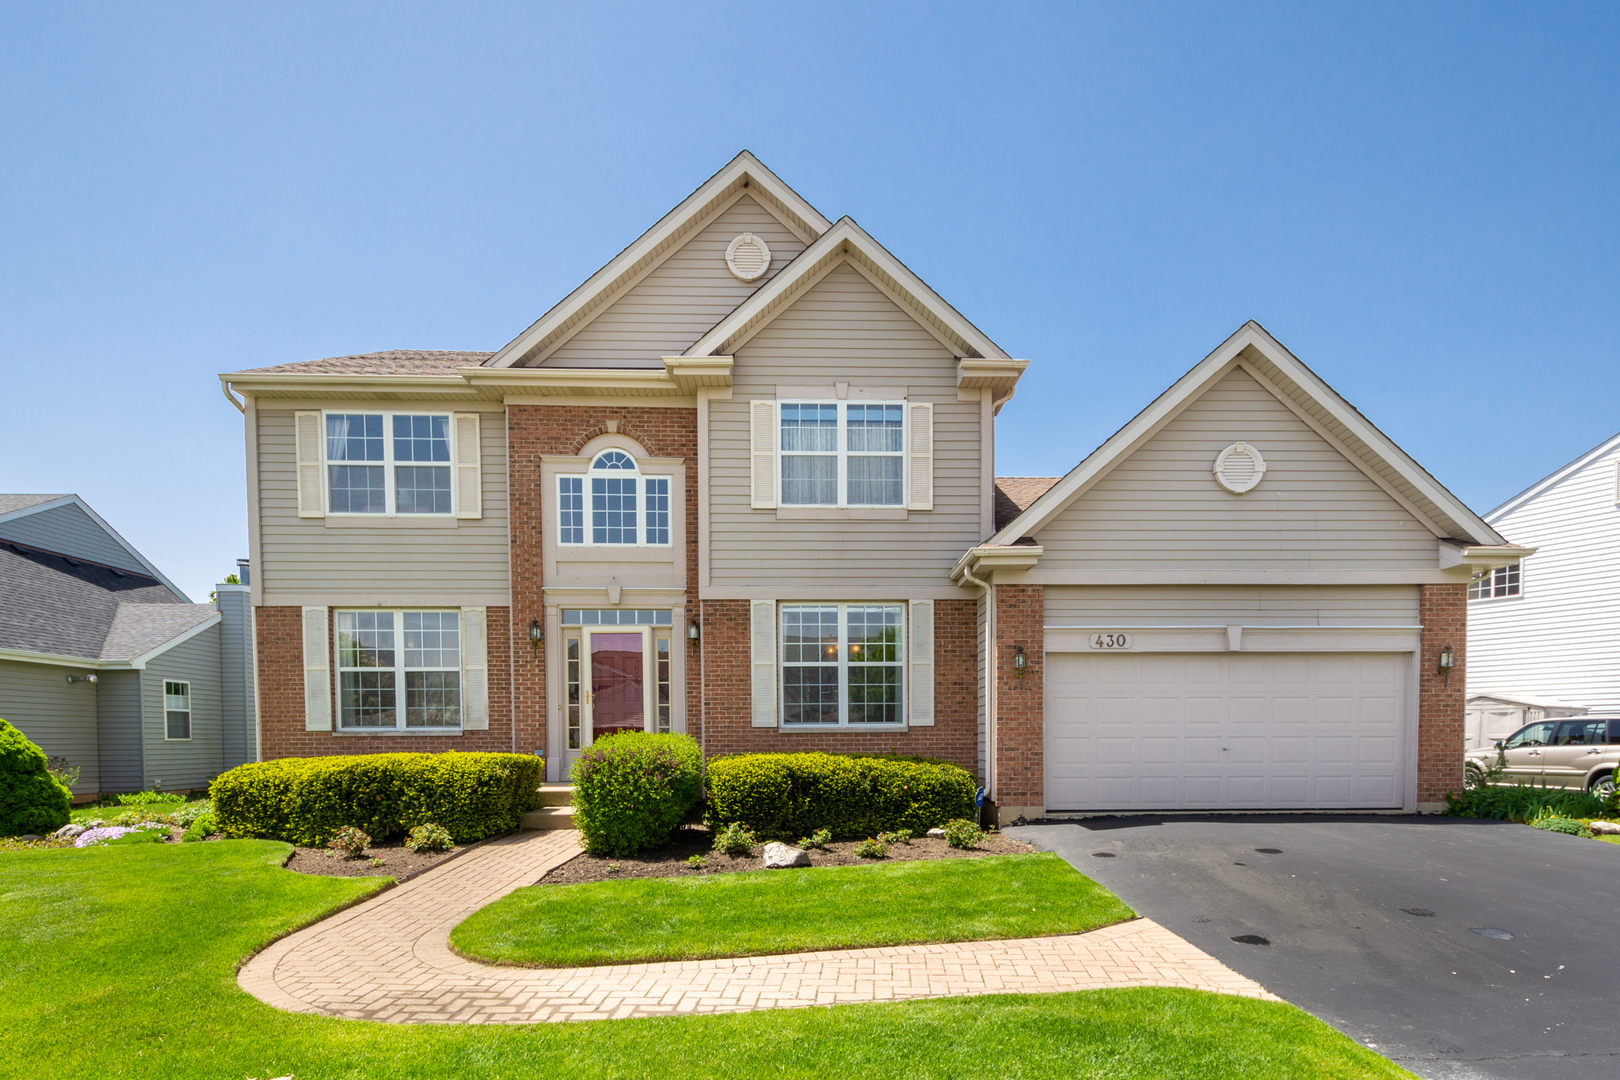 430 Rosewood Crossing, Lindenhurst, Illinois 60046